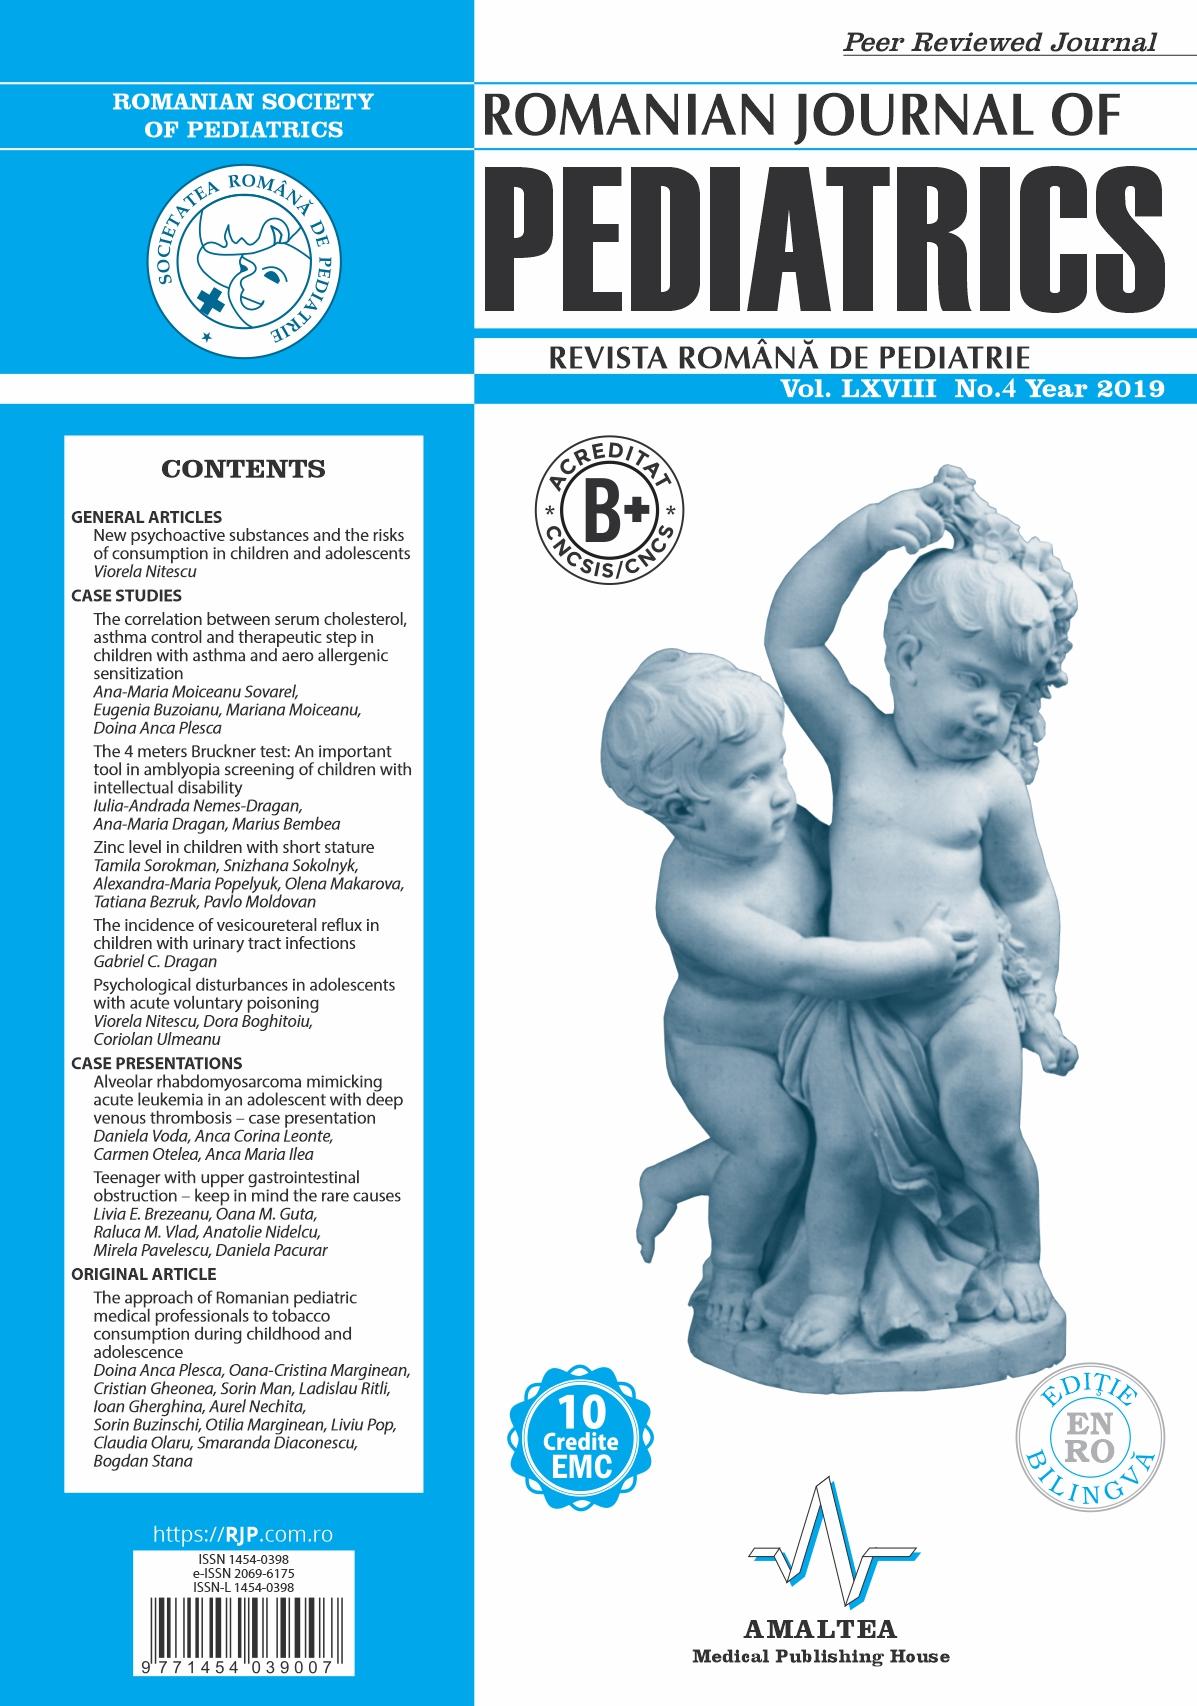 Romanian Journal of Pediatrics   Volume LXVIII, No. 4, Year 2019